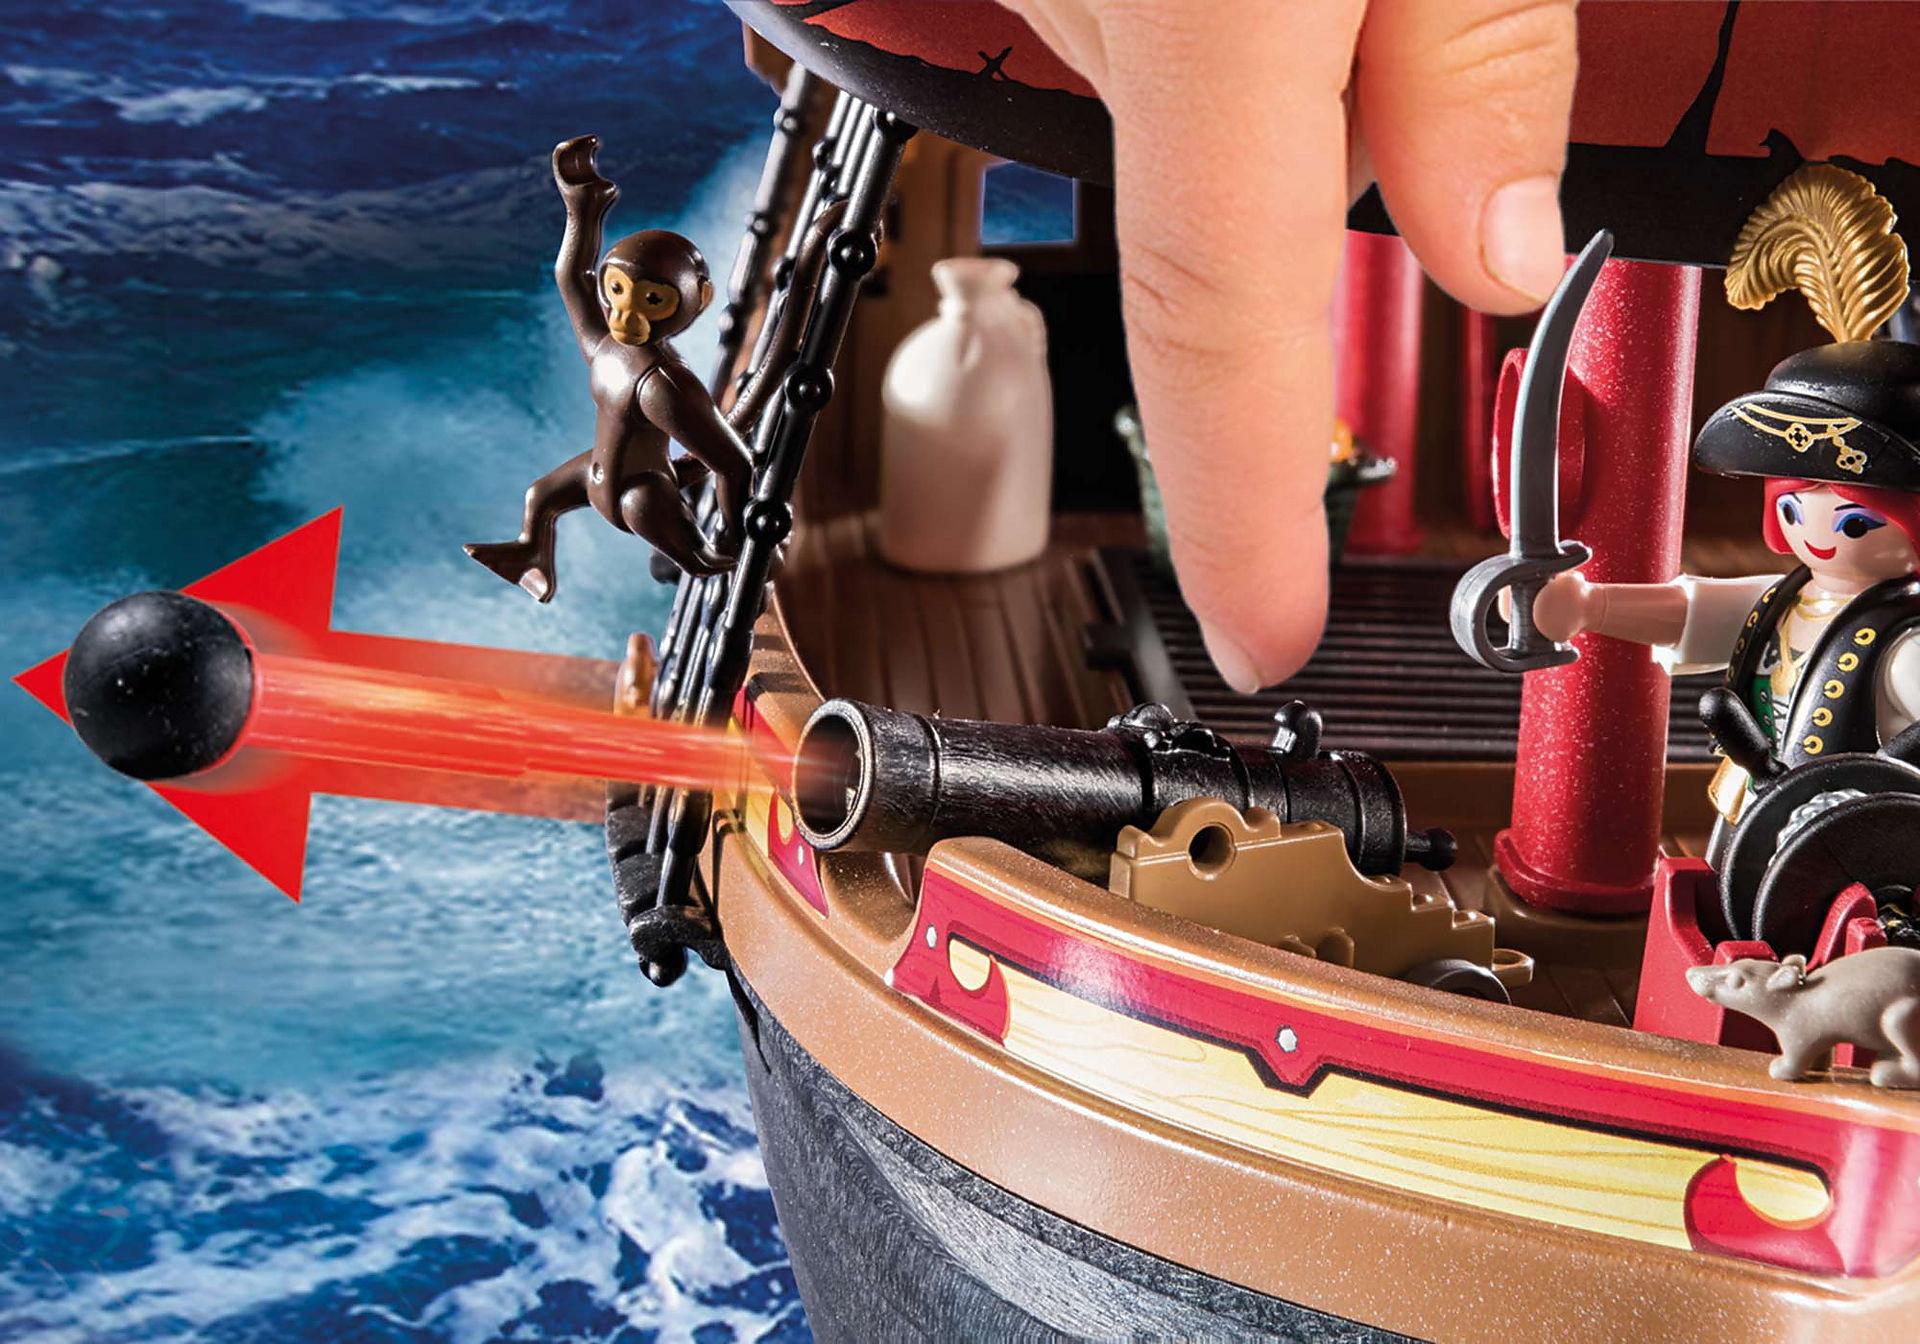 70411 Barco Pirata Calavera zoom image5